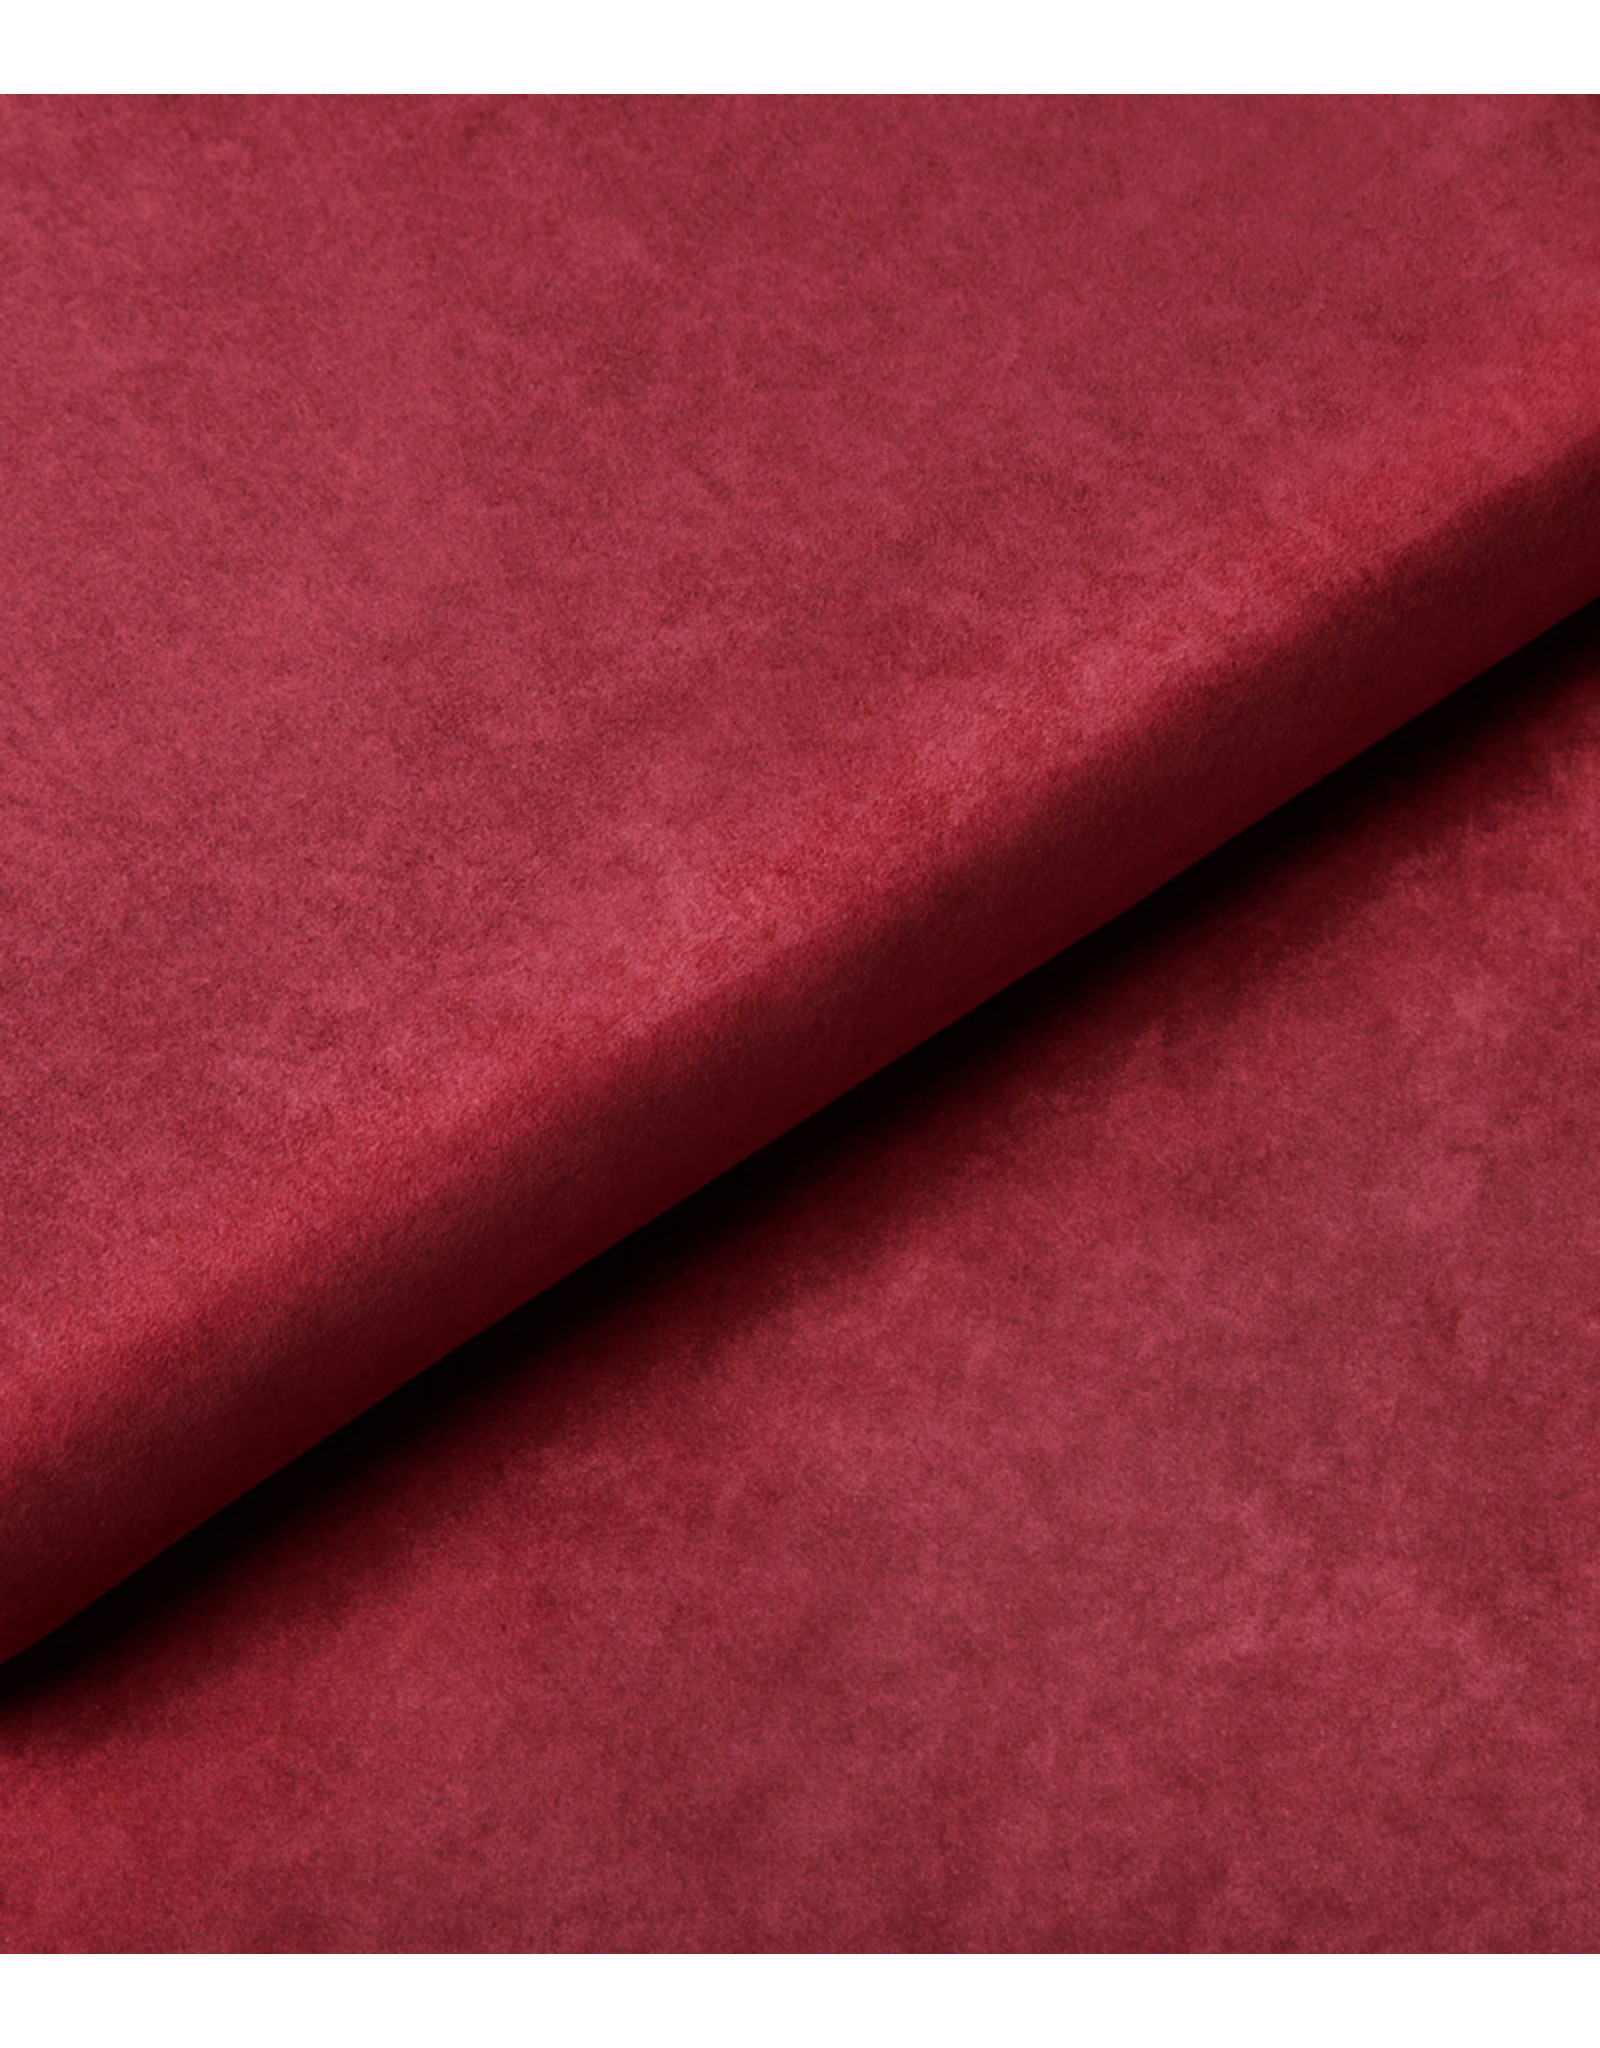 INVITALIS Ersatzbezug - Vitalymed Soft Pflaume